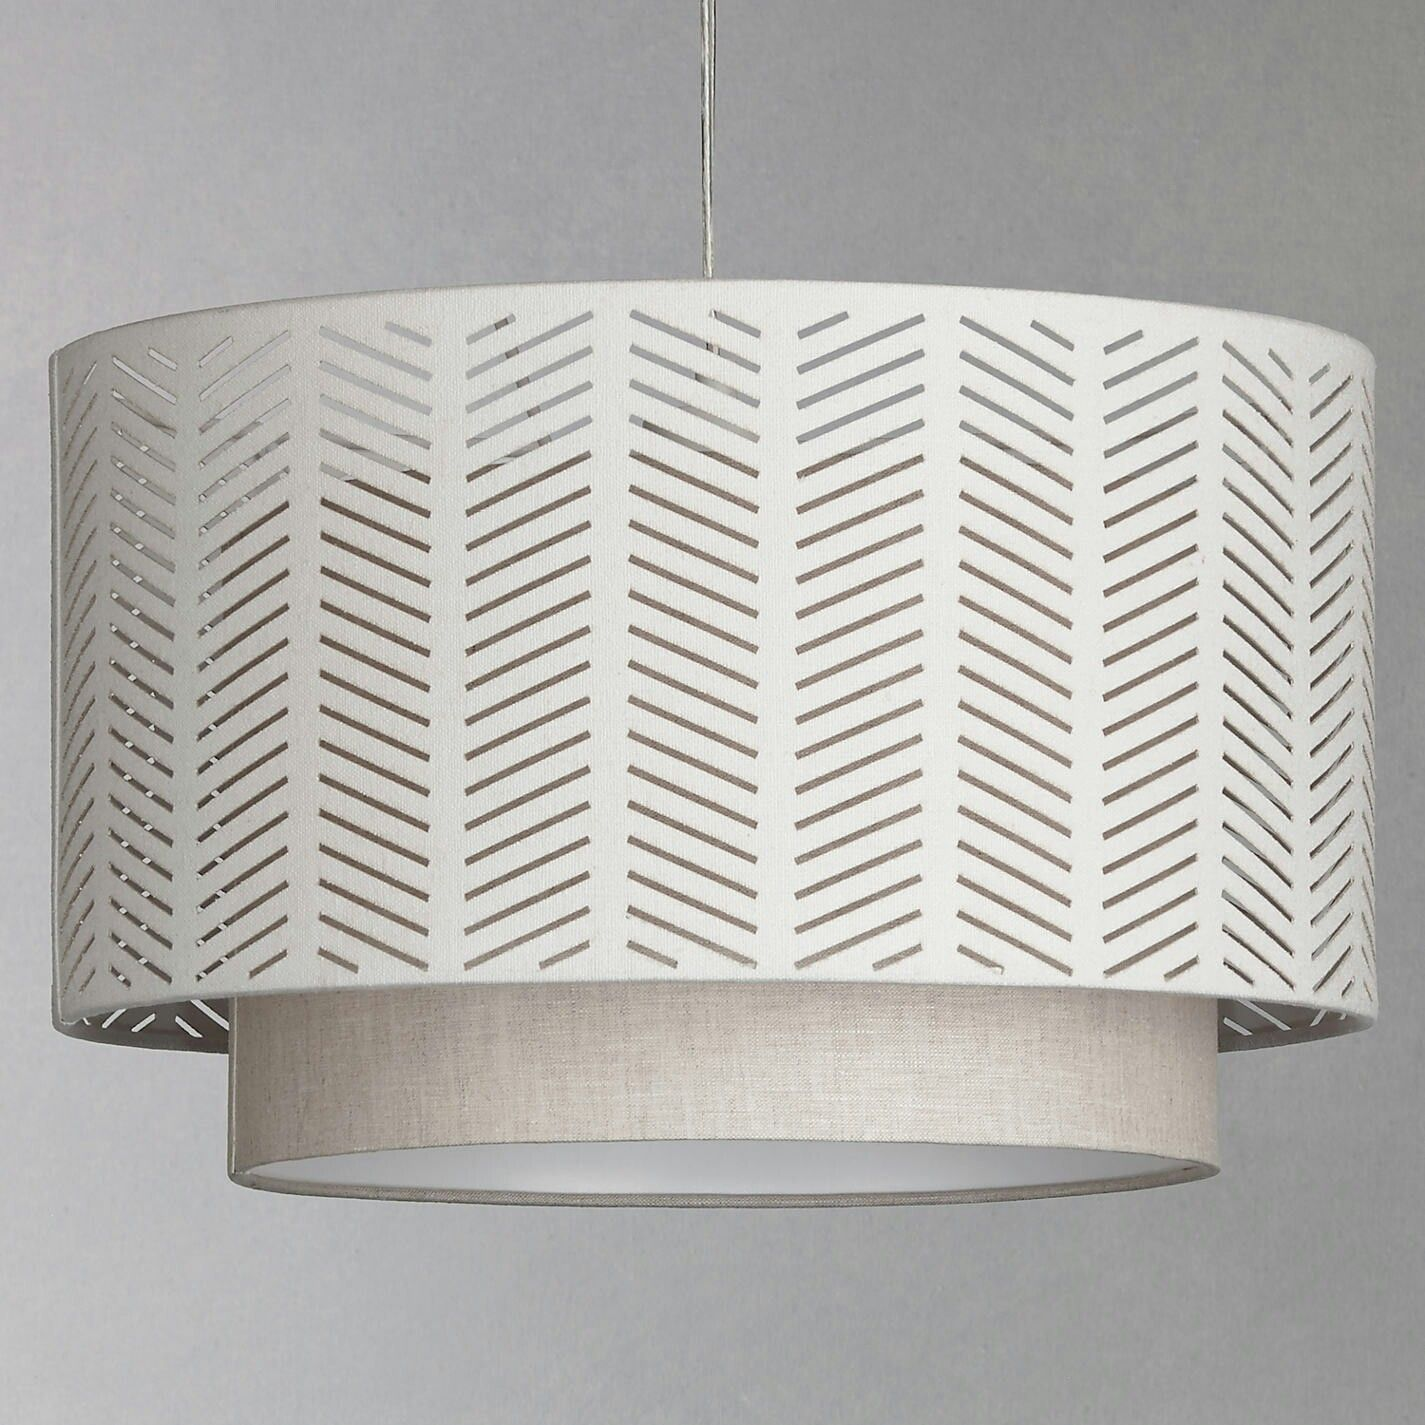 John Lewis breeze light shade | Ceiling lamp shades, Lamp ...